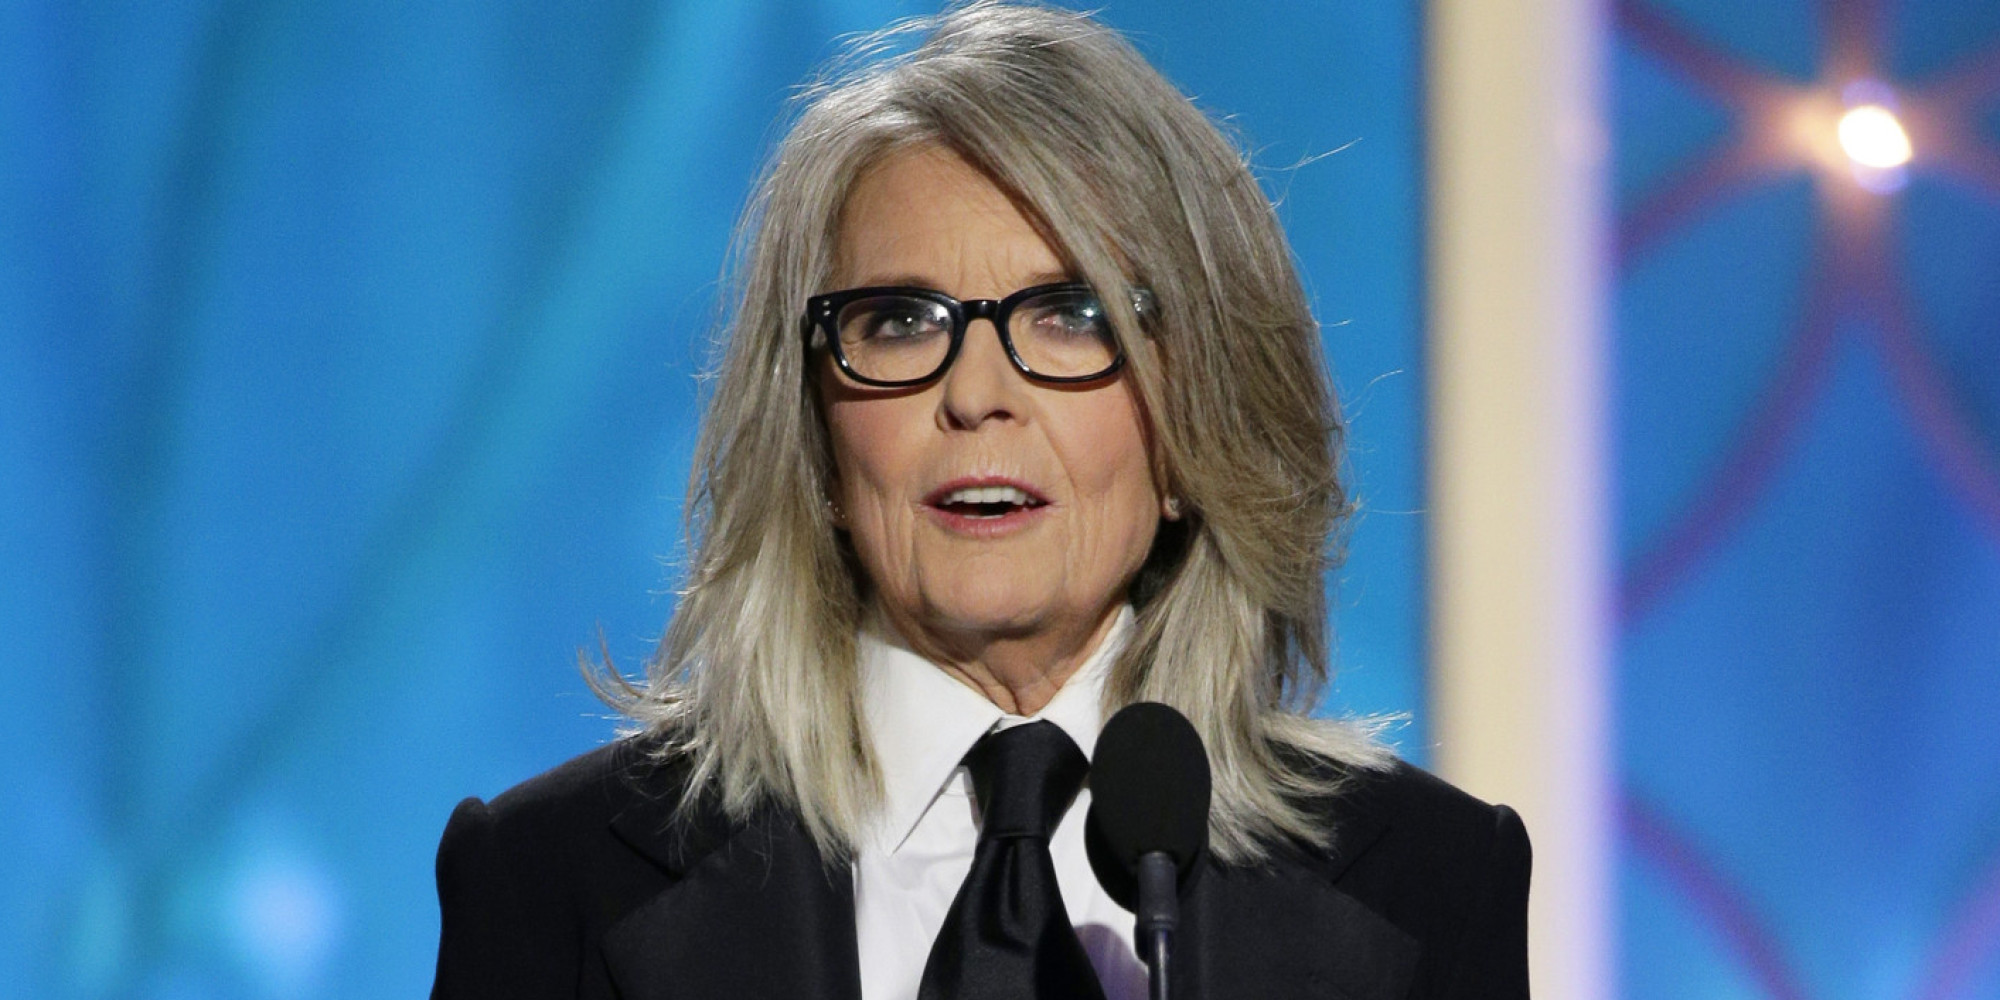 News Diane Keaton Diane Keaton's L'oreal ad